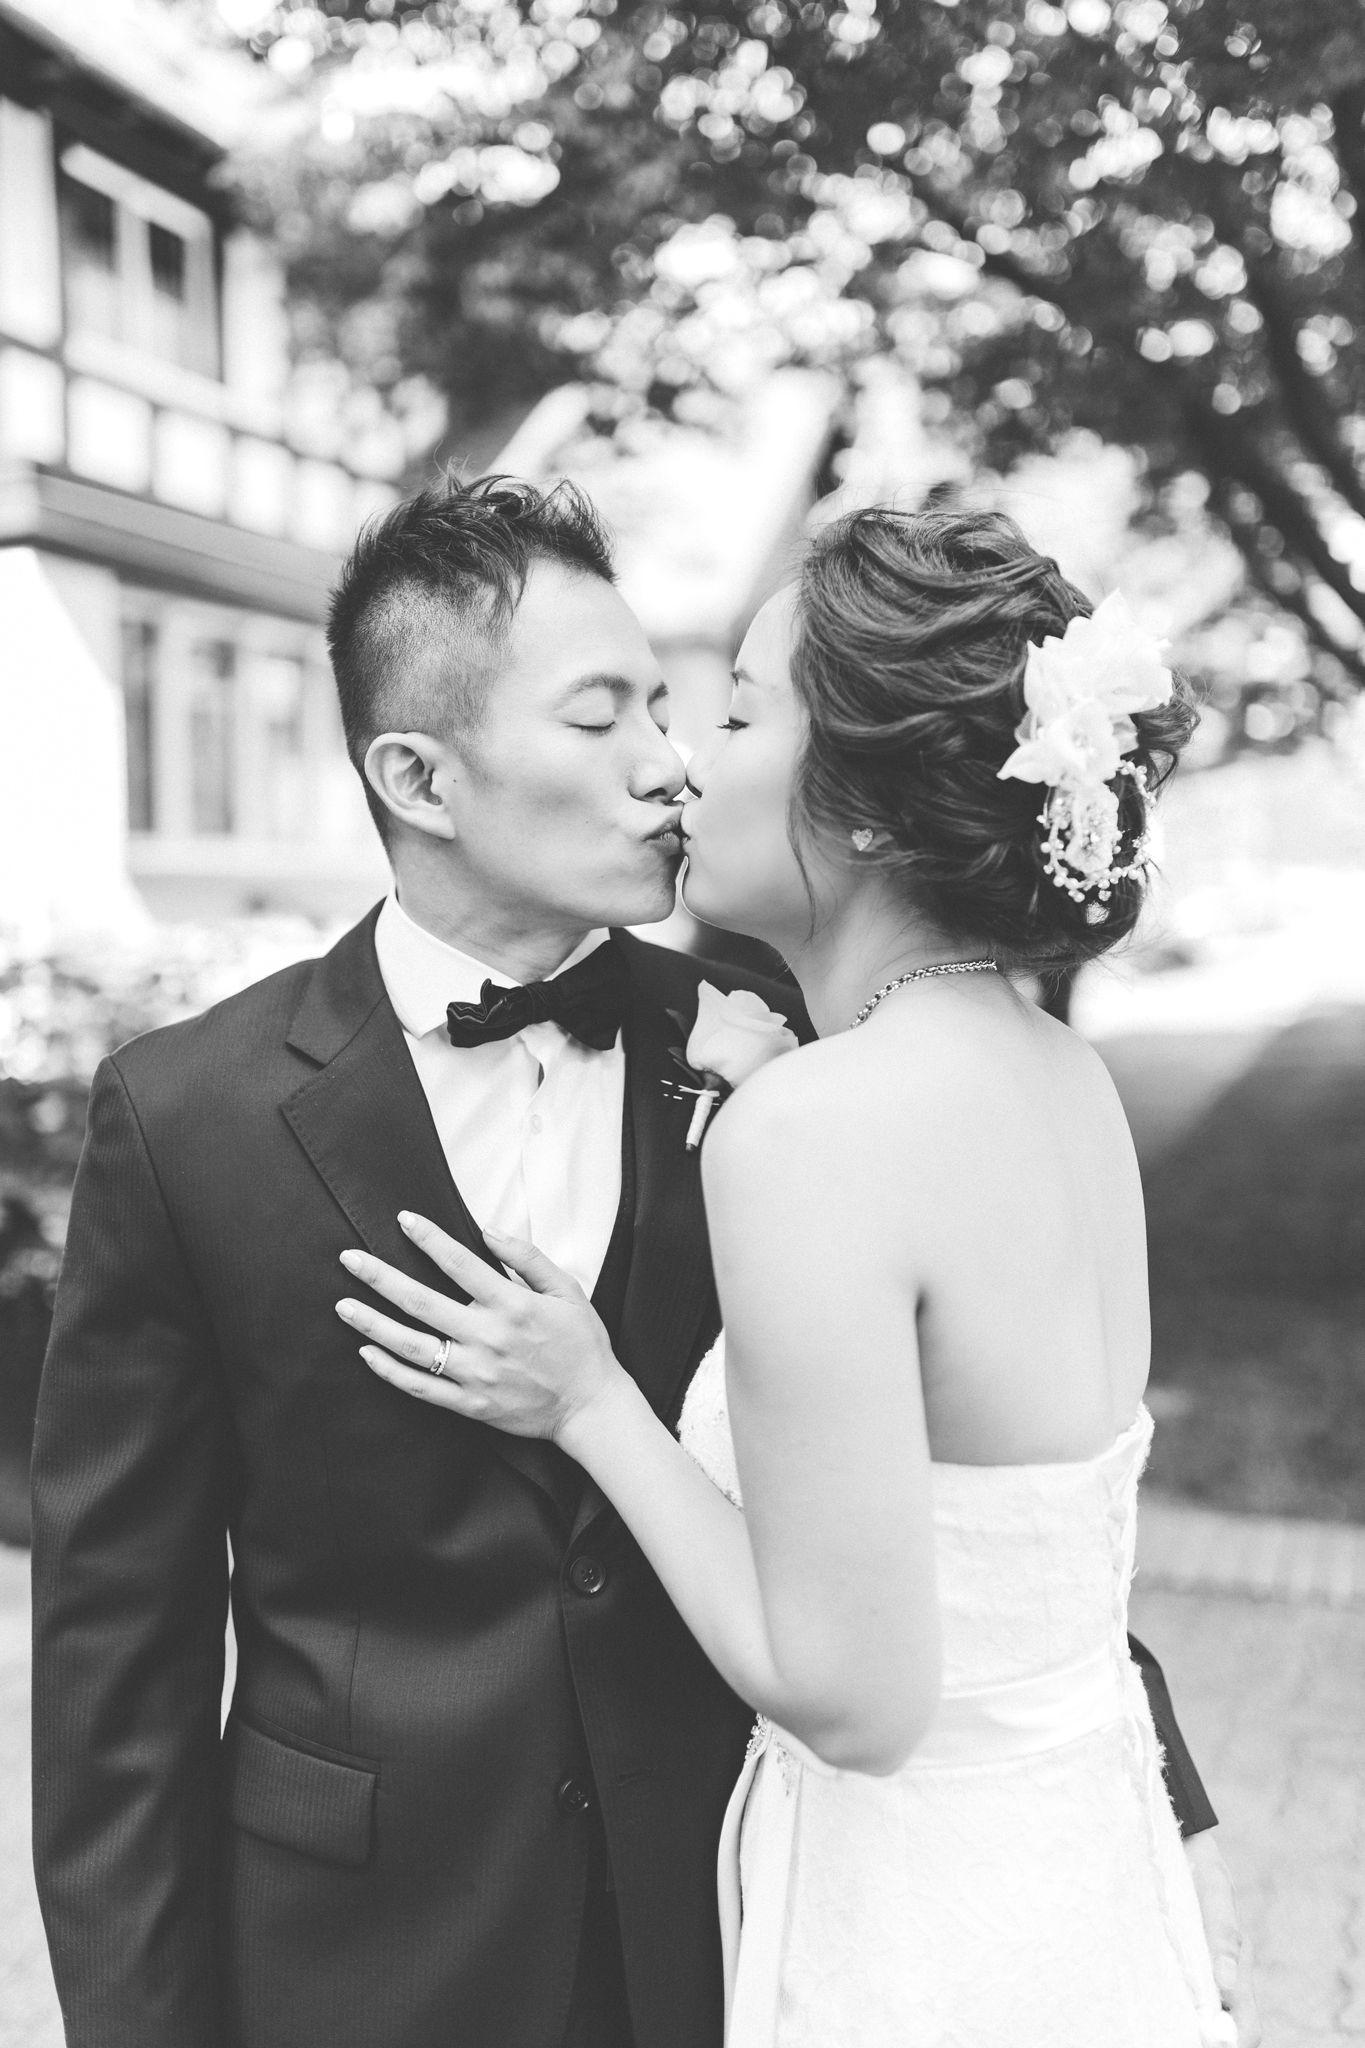 IMG_2774-VANCOUVER-WEDDING-PHOTOGRAPHER-JENNIFER-PICARD-PHOTOGRAPHY-FINE-ART-WEDDINGS.jpg